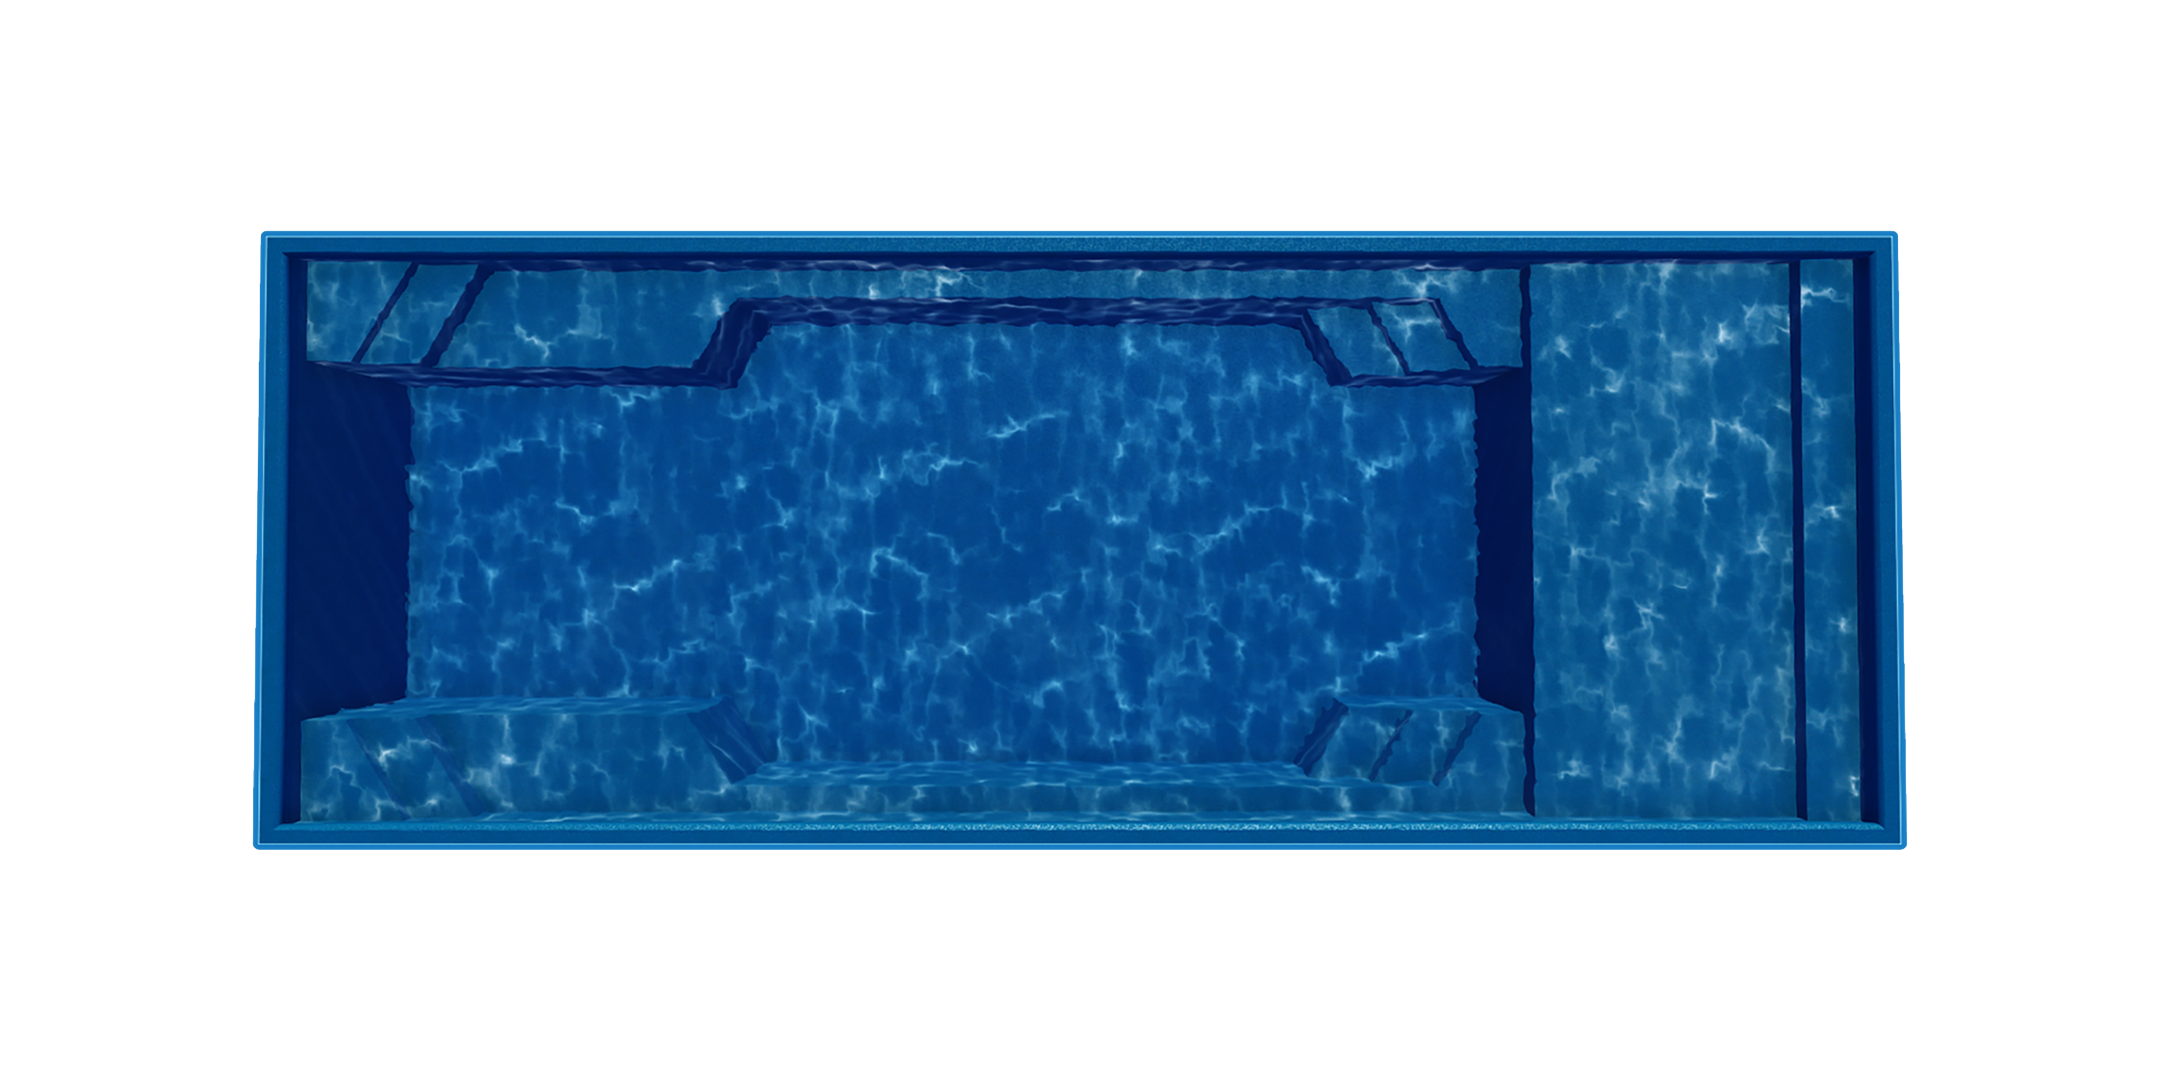 fiberglass pool company in fredericksburg